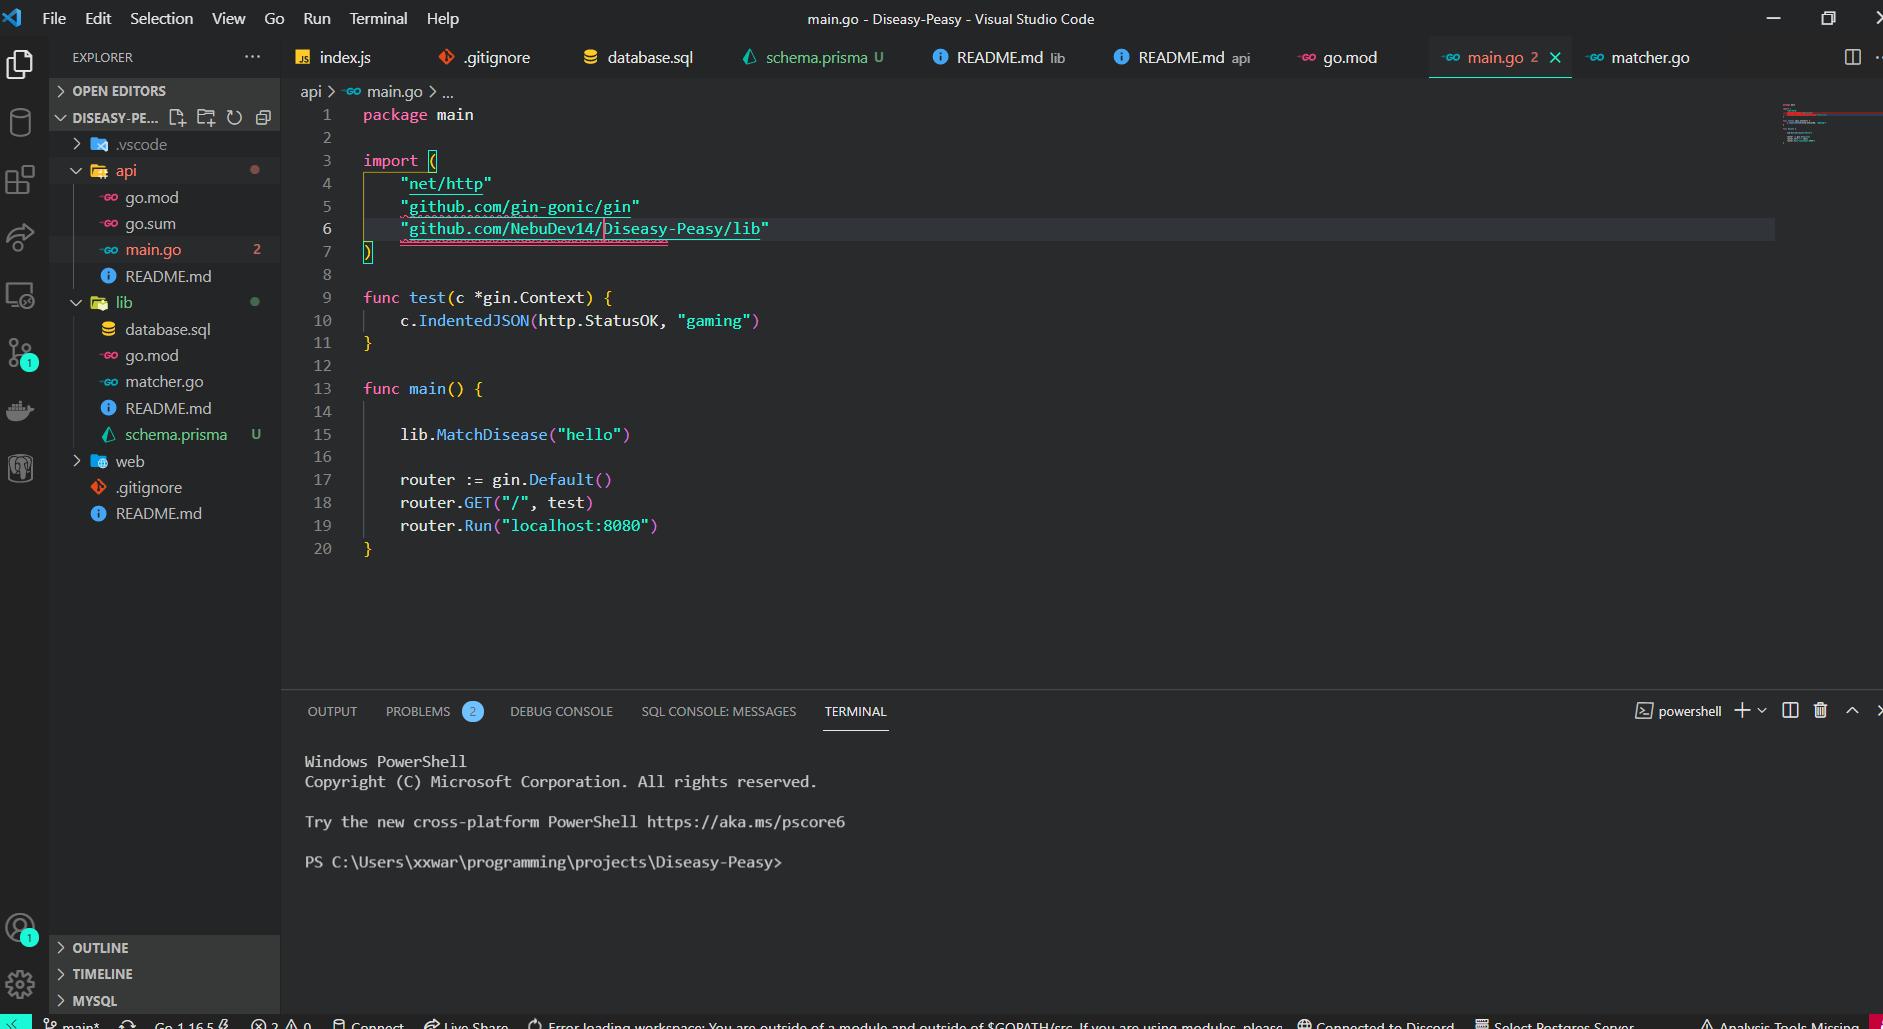 https://cloud-rghbmb120-hack-club-bot.vercel.app/0image.png